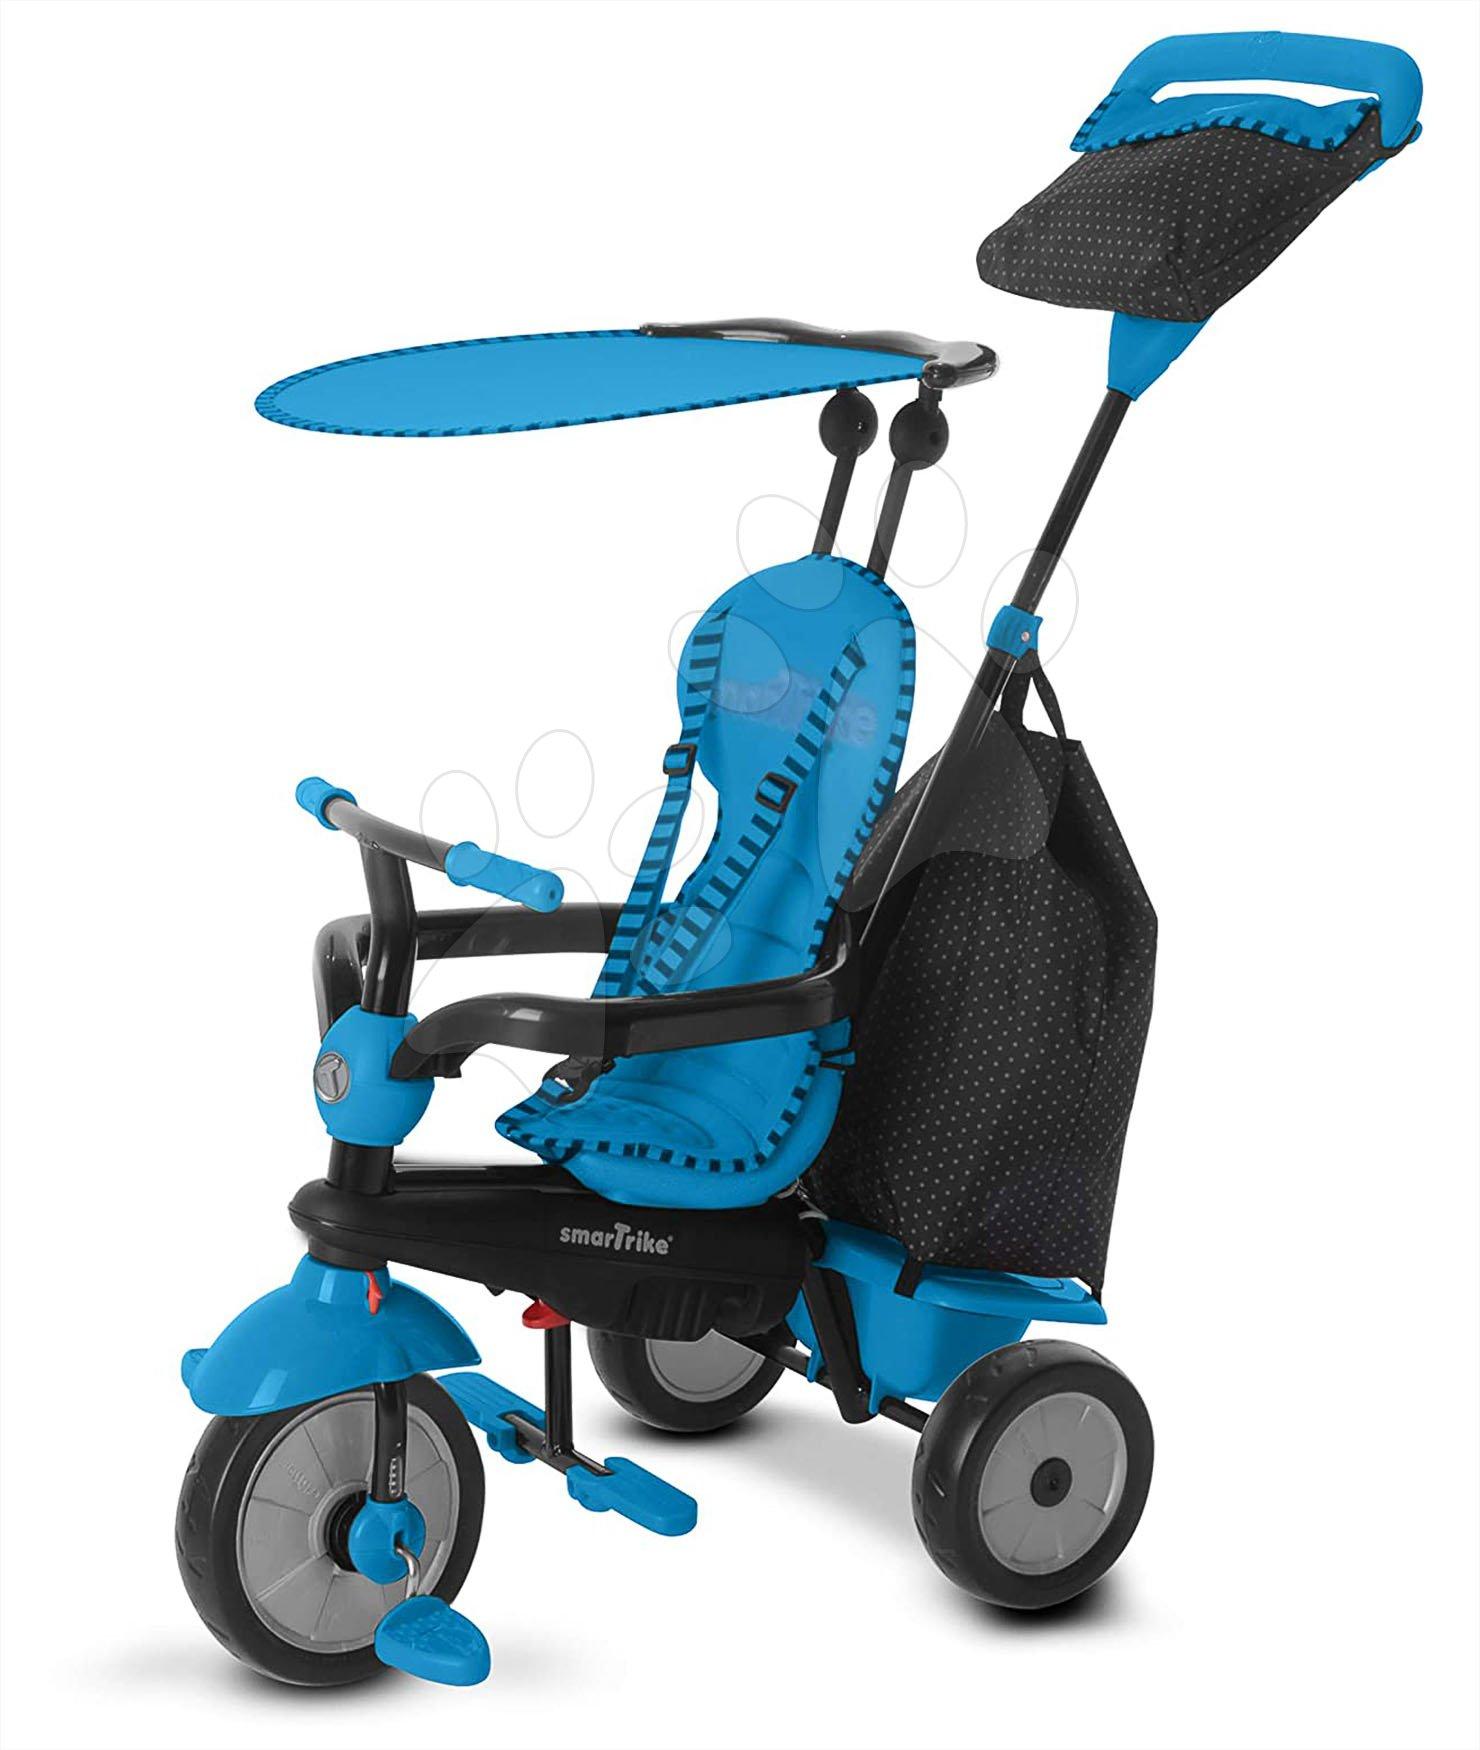 Trojkolky od 10 mesiacov - Trojkolka Glow Touch Steering 4v1 smarTrike modro-čierna od 10 mes